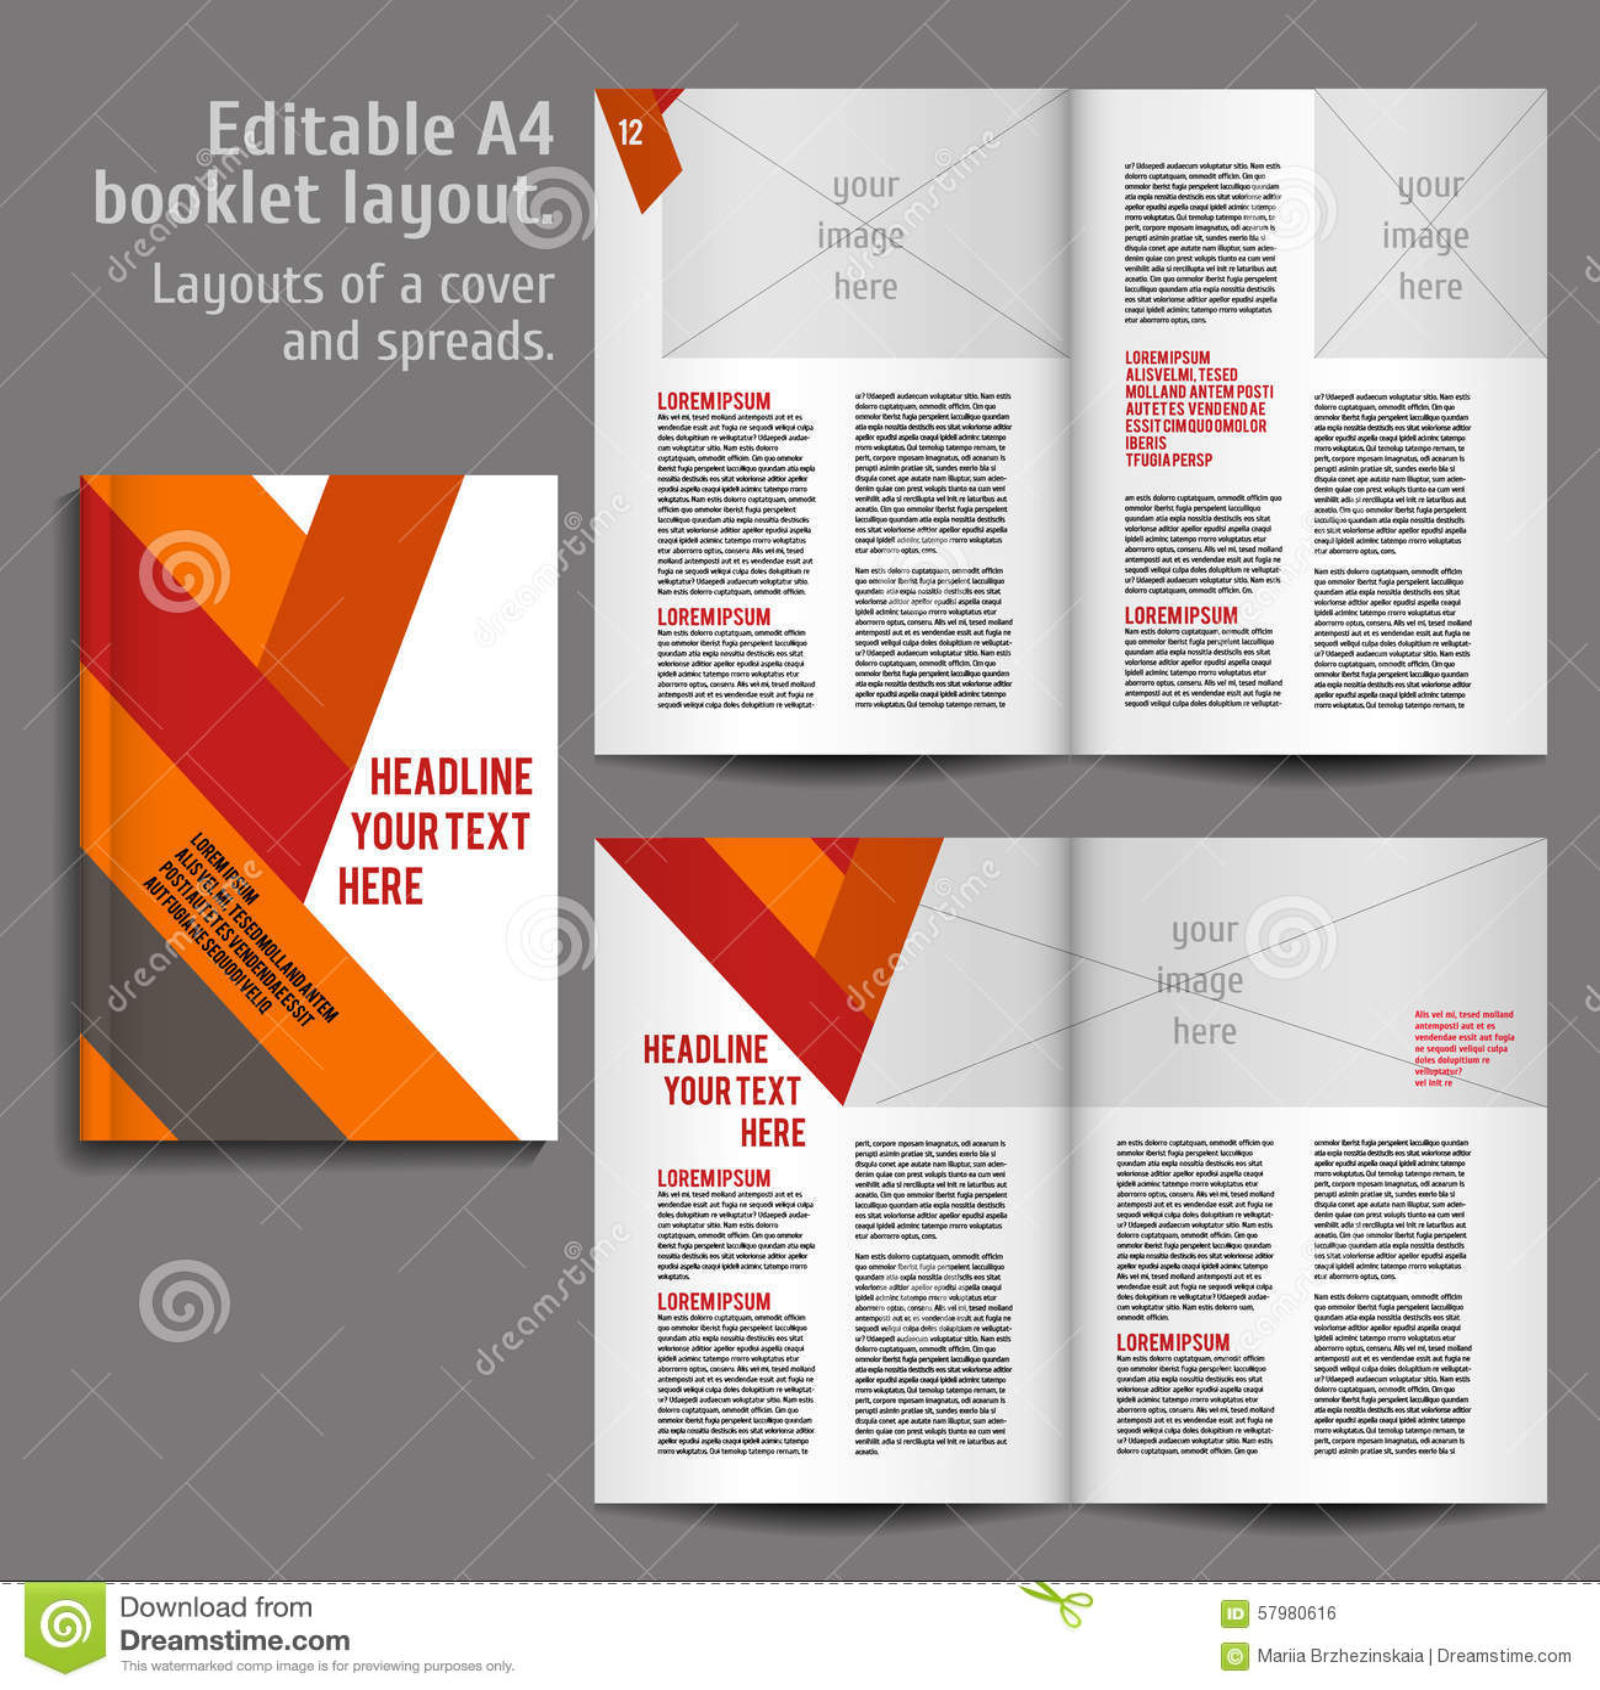 Buch a4 plan design schablone vektor abbildung for Buch design